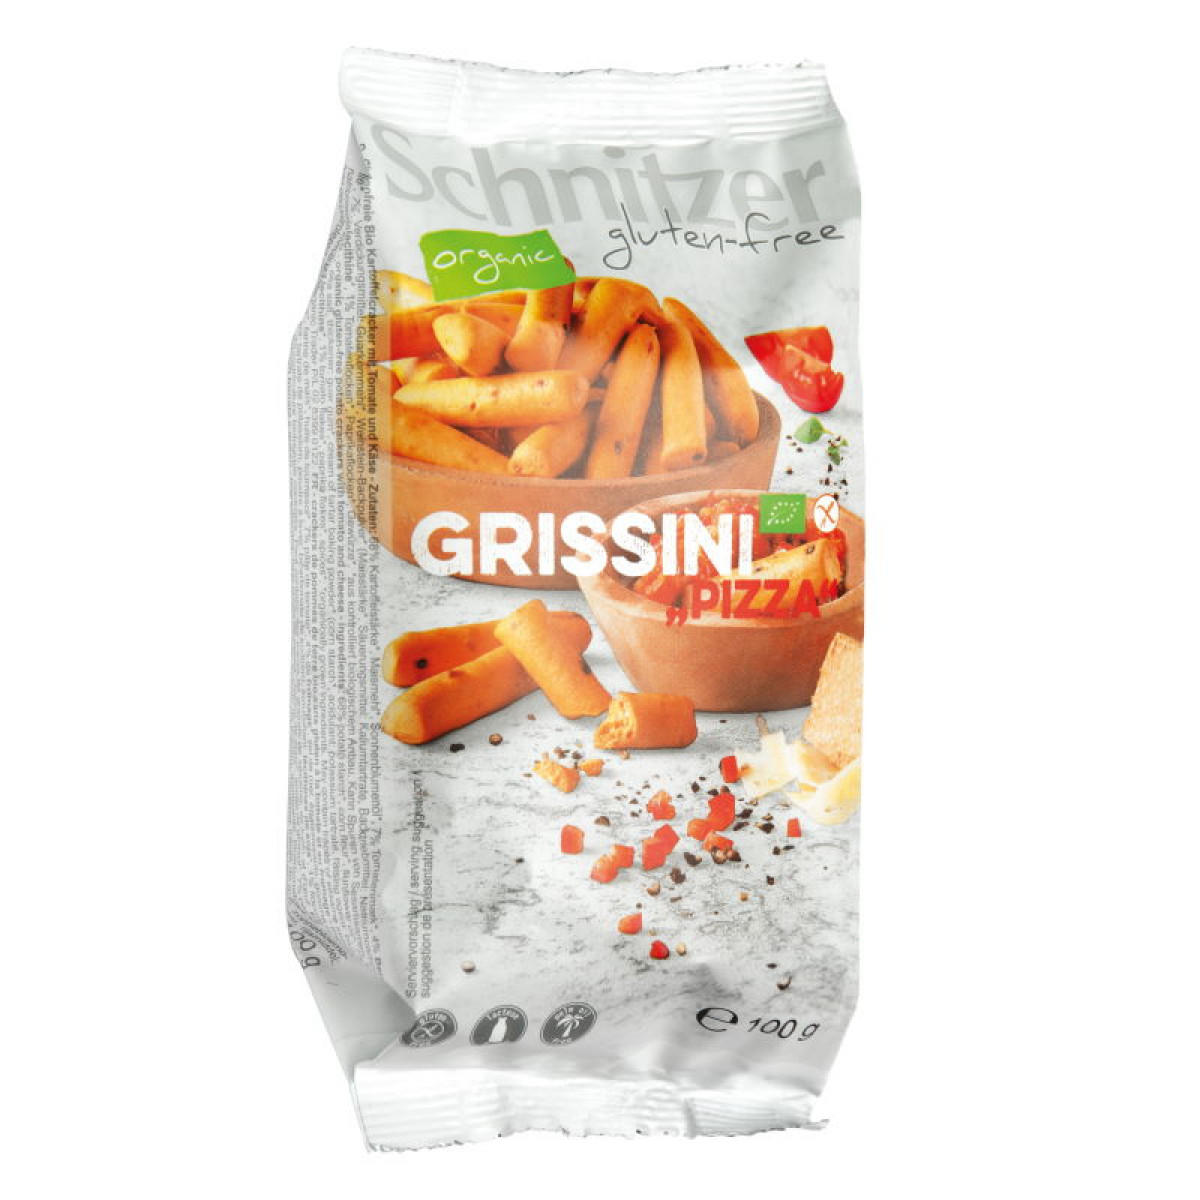 Grissini Pizza (soepstengels)